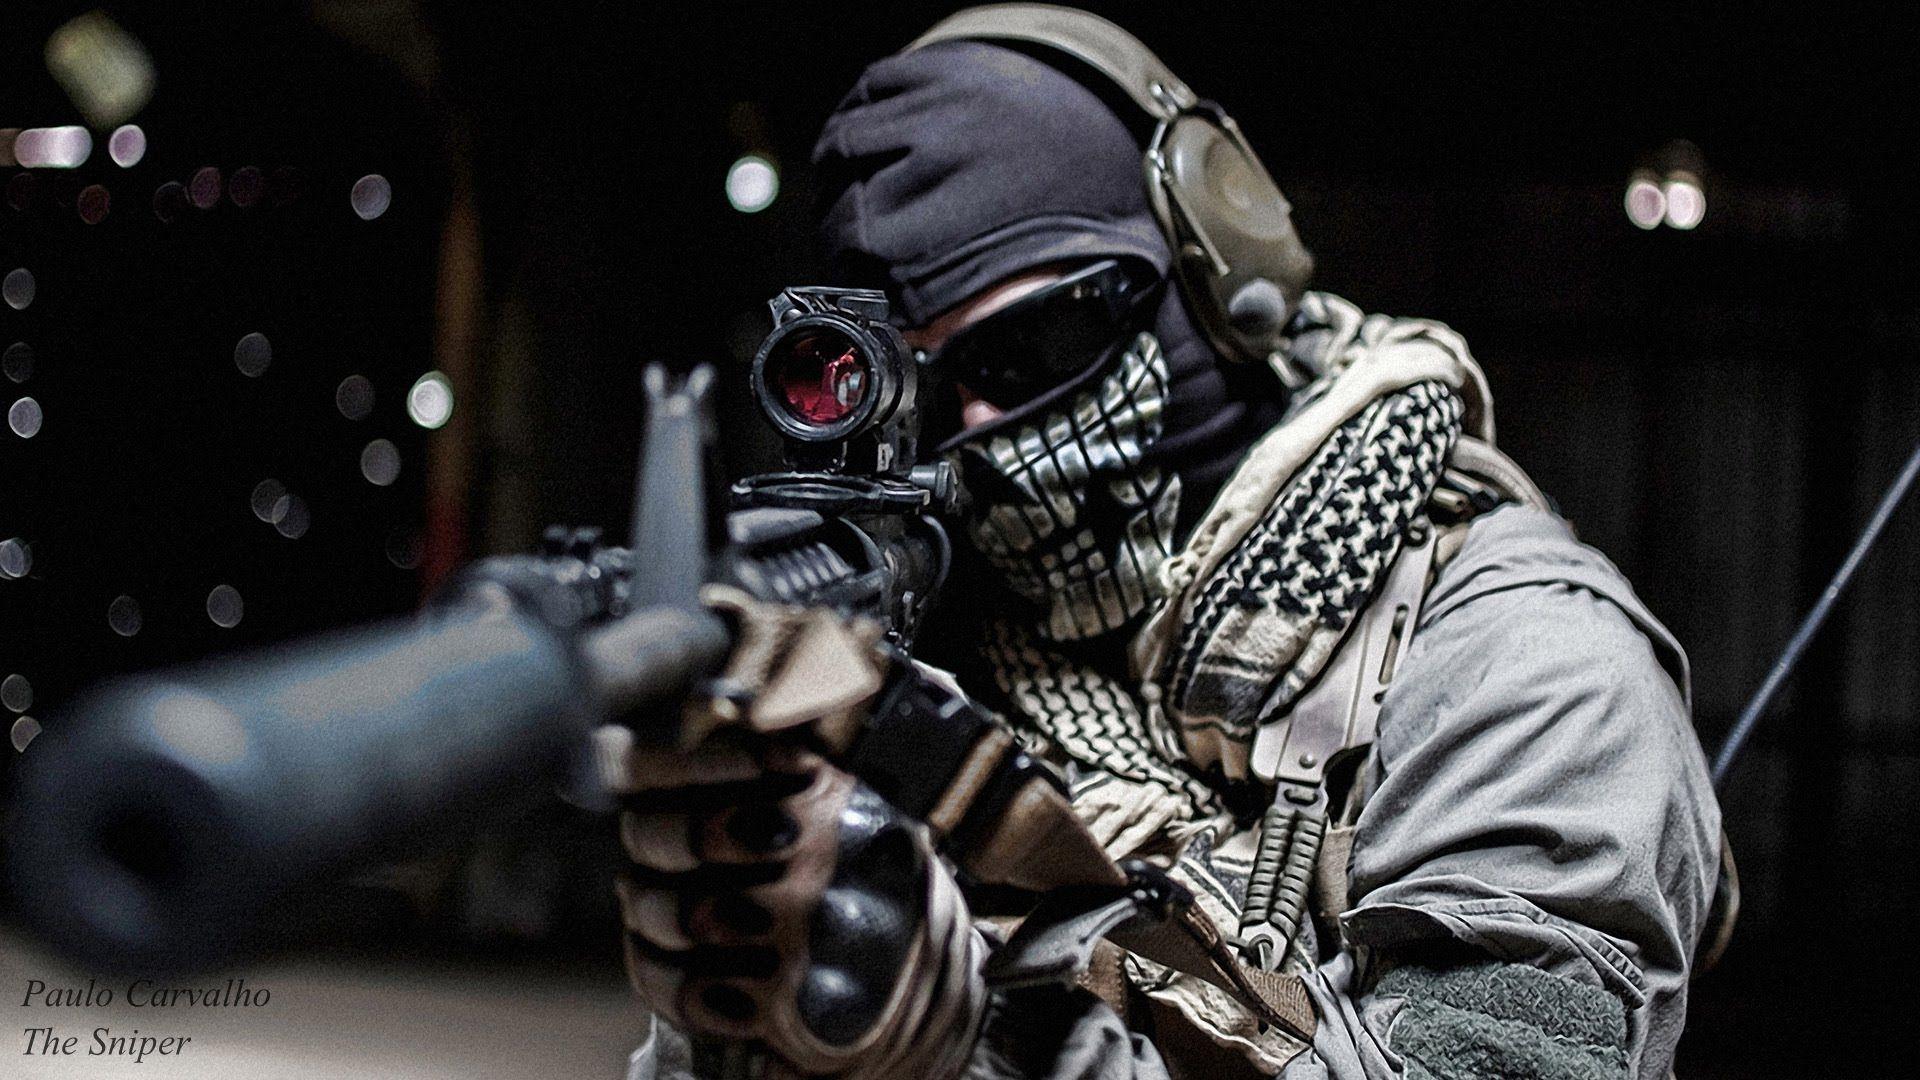 War sniper battle game Download - War sniper battle game 2.0.1 ...